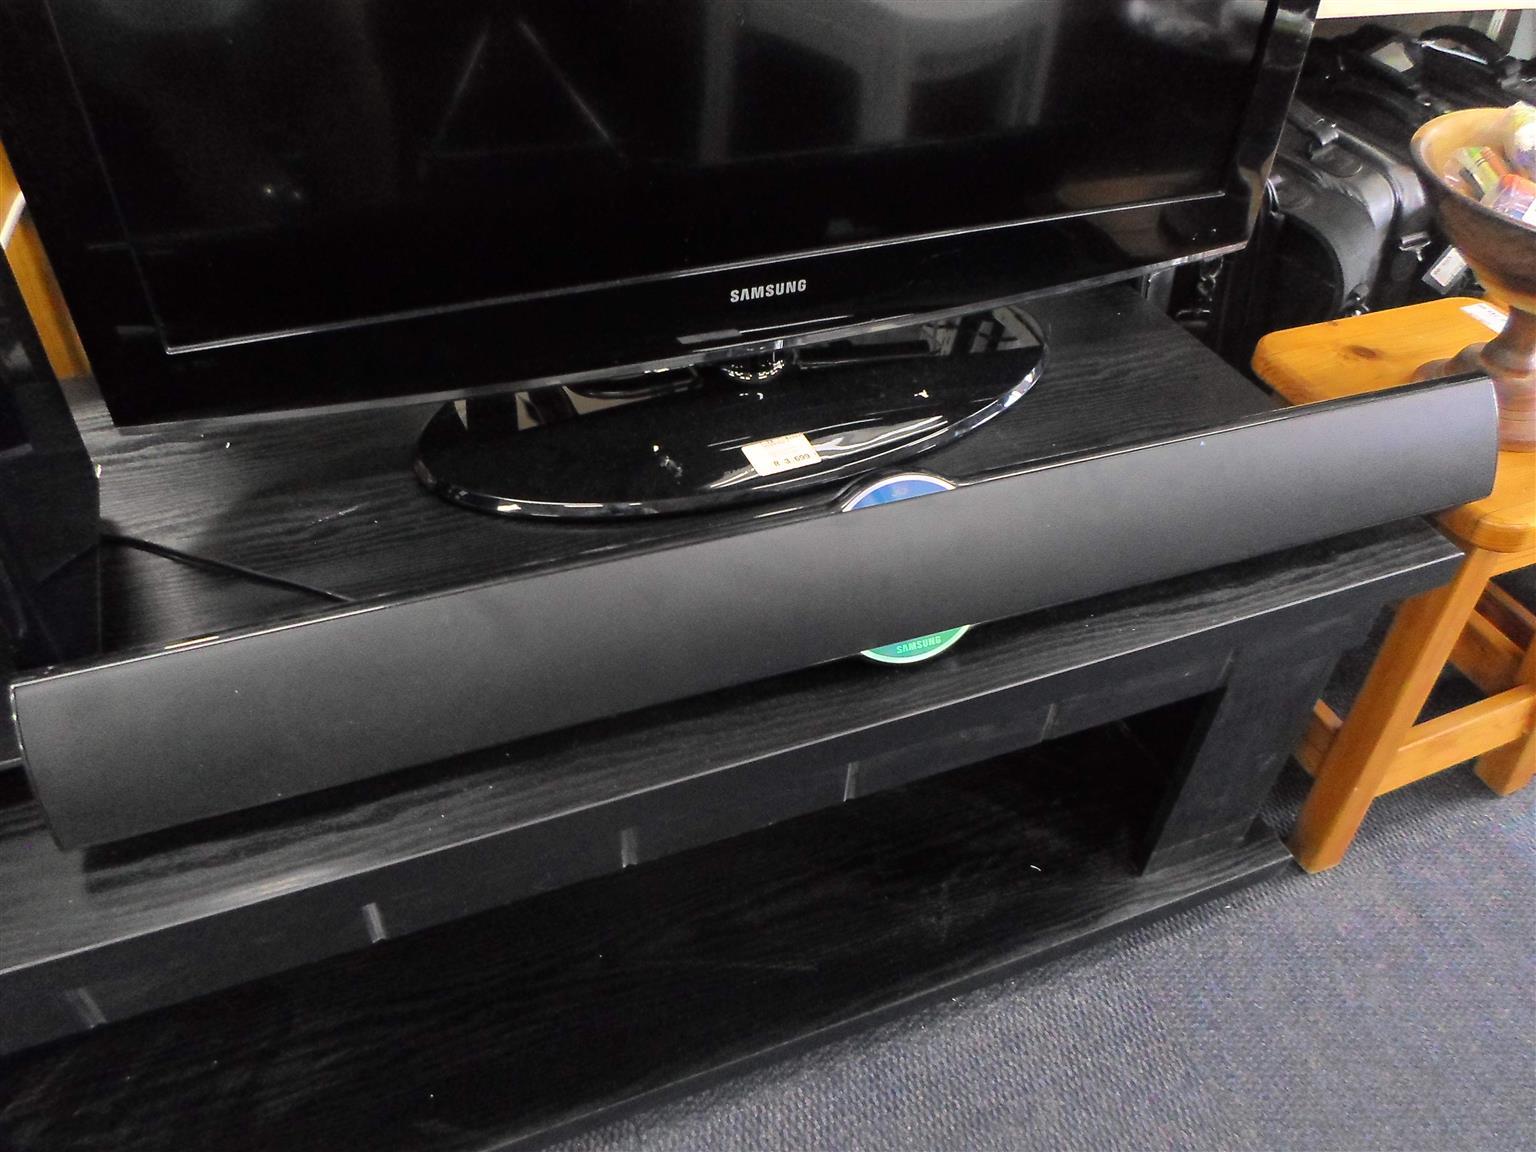 Samsung Wireless Subwoofer & Soundbar